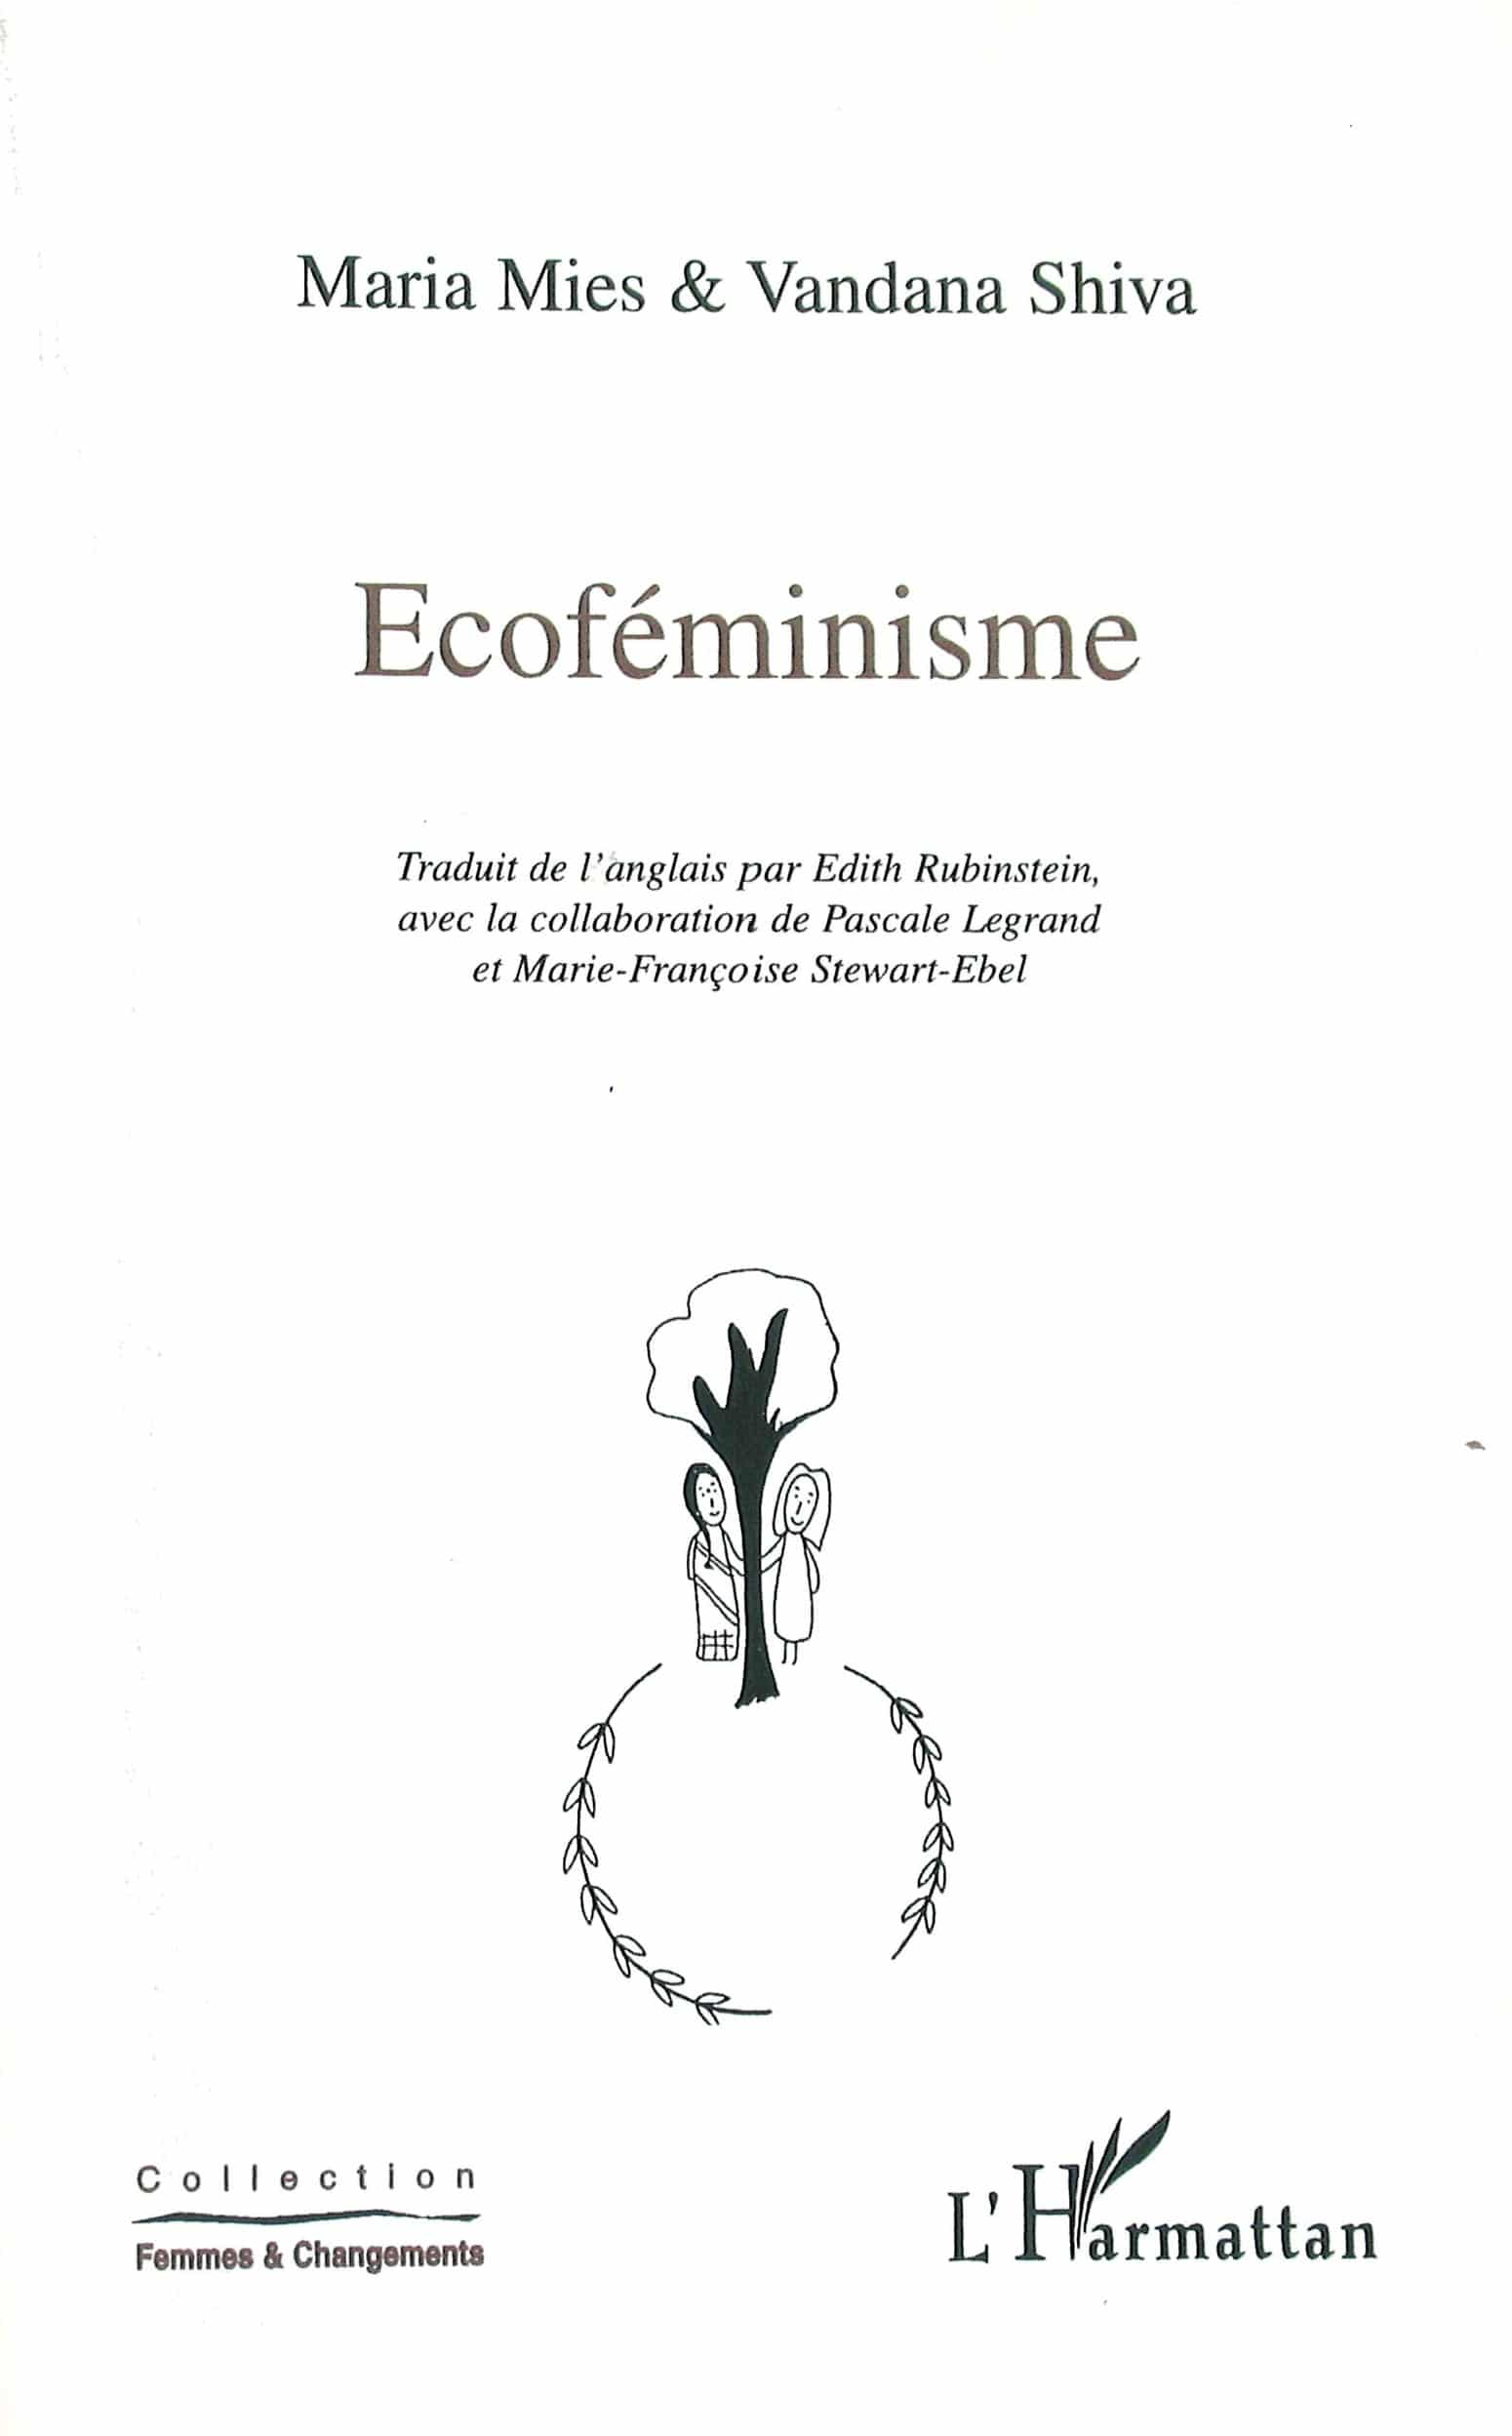 Maria Mies et Vandana Shiva, Ecoféminisme